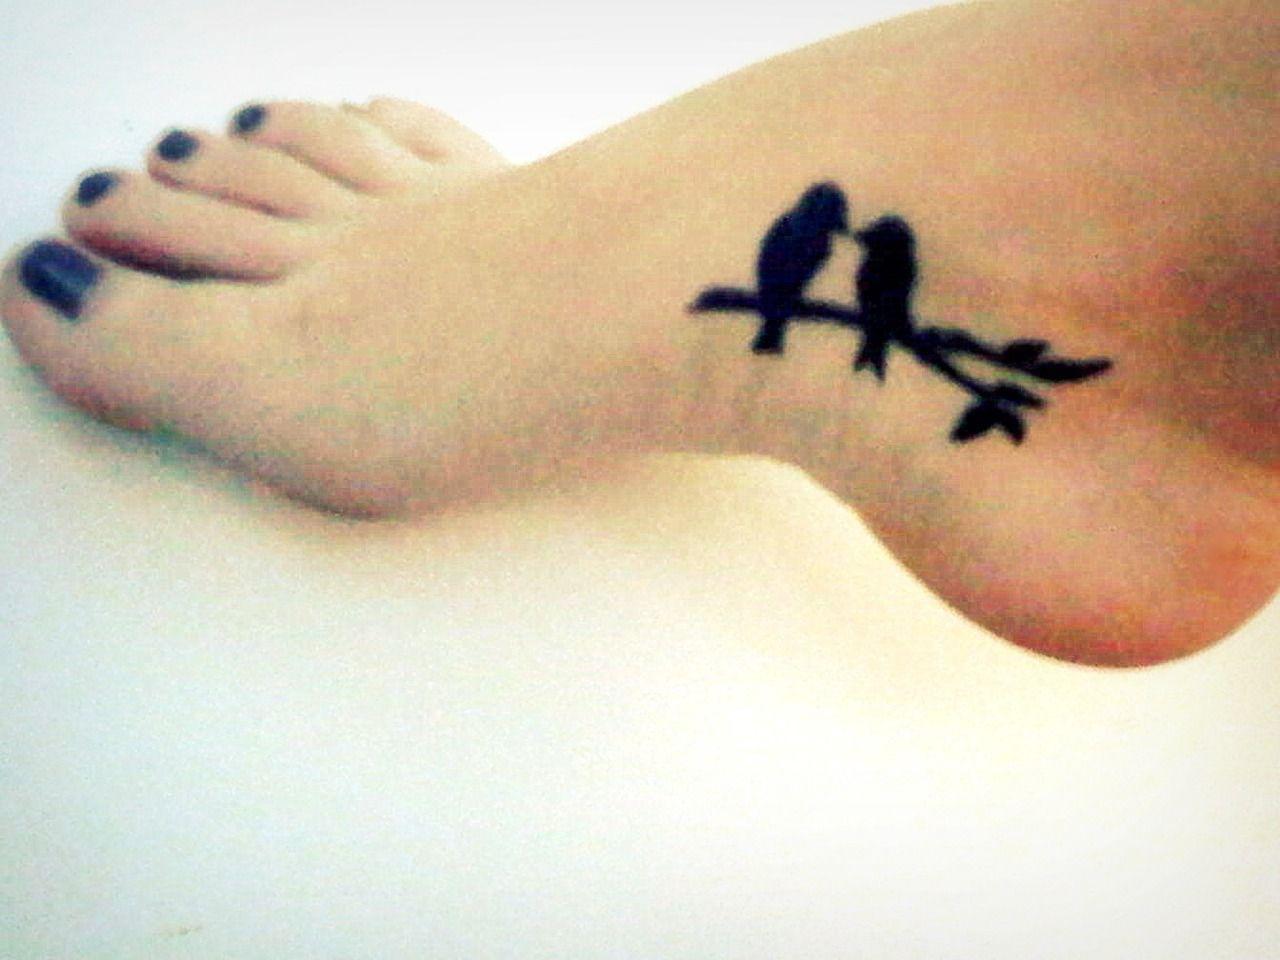 Ideas about bird tattoos on pinterest tattoos - Birds Tattoo On Foot 50 Awesome Foot Tattoo Designs